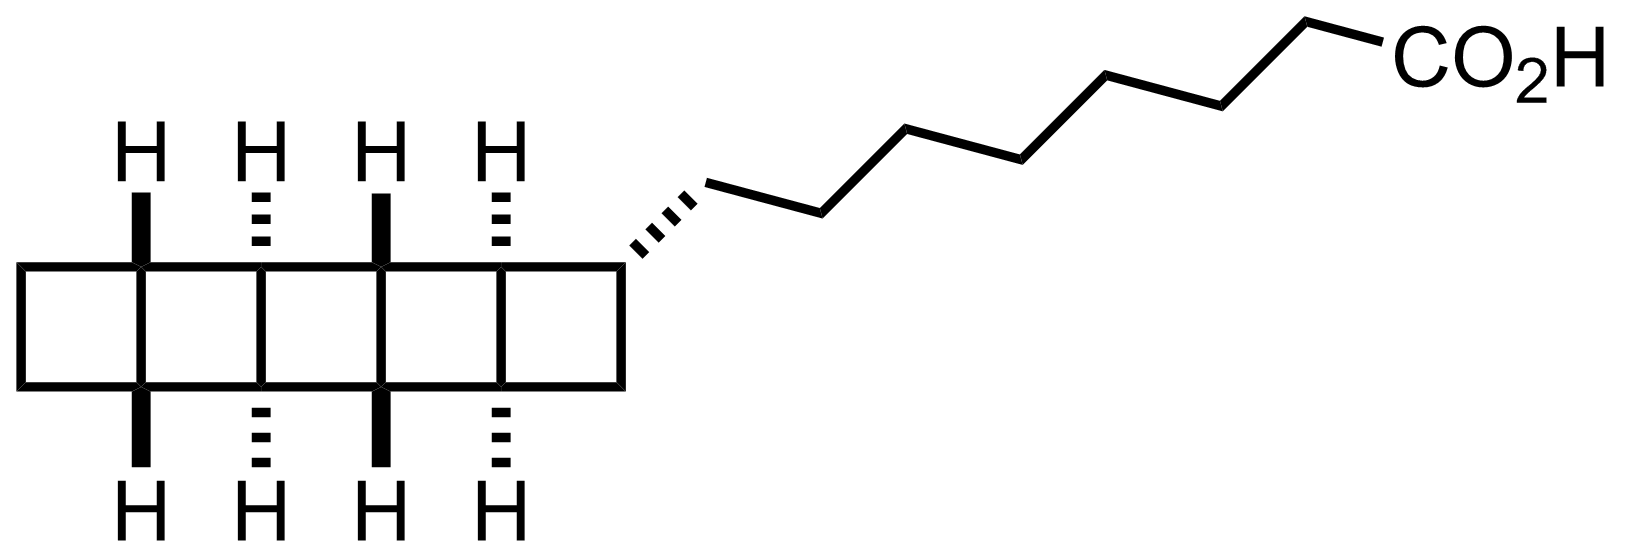 Pentacycloanammoxic Acid structure